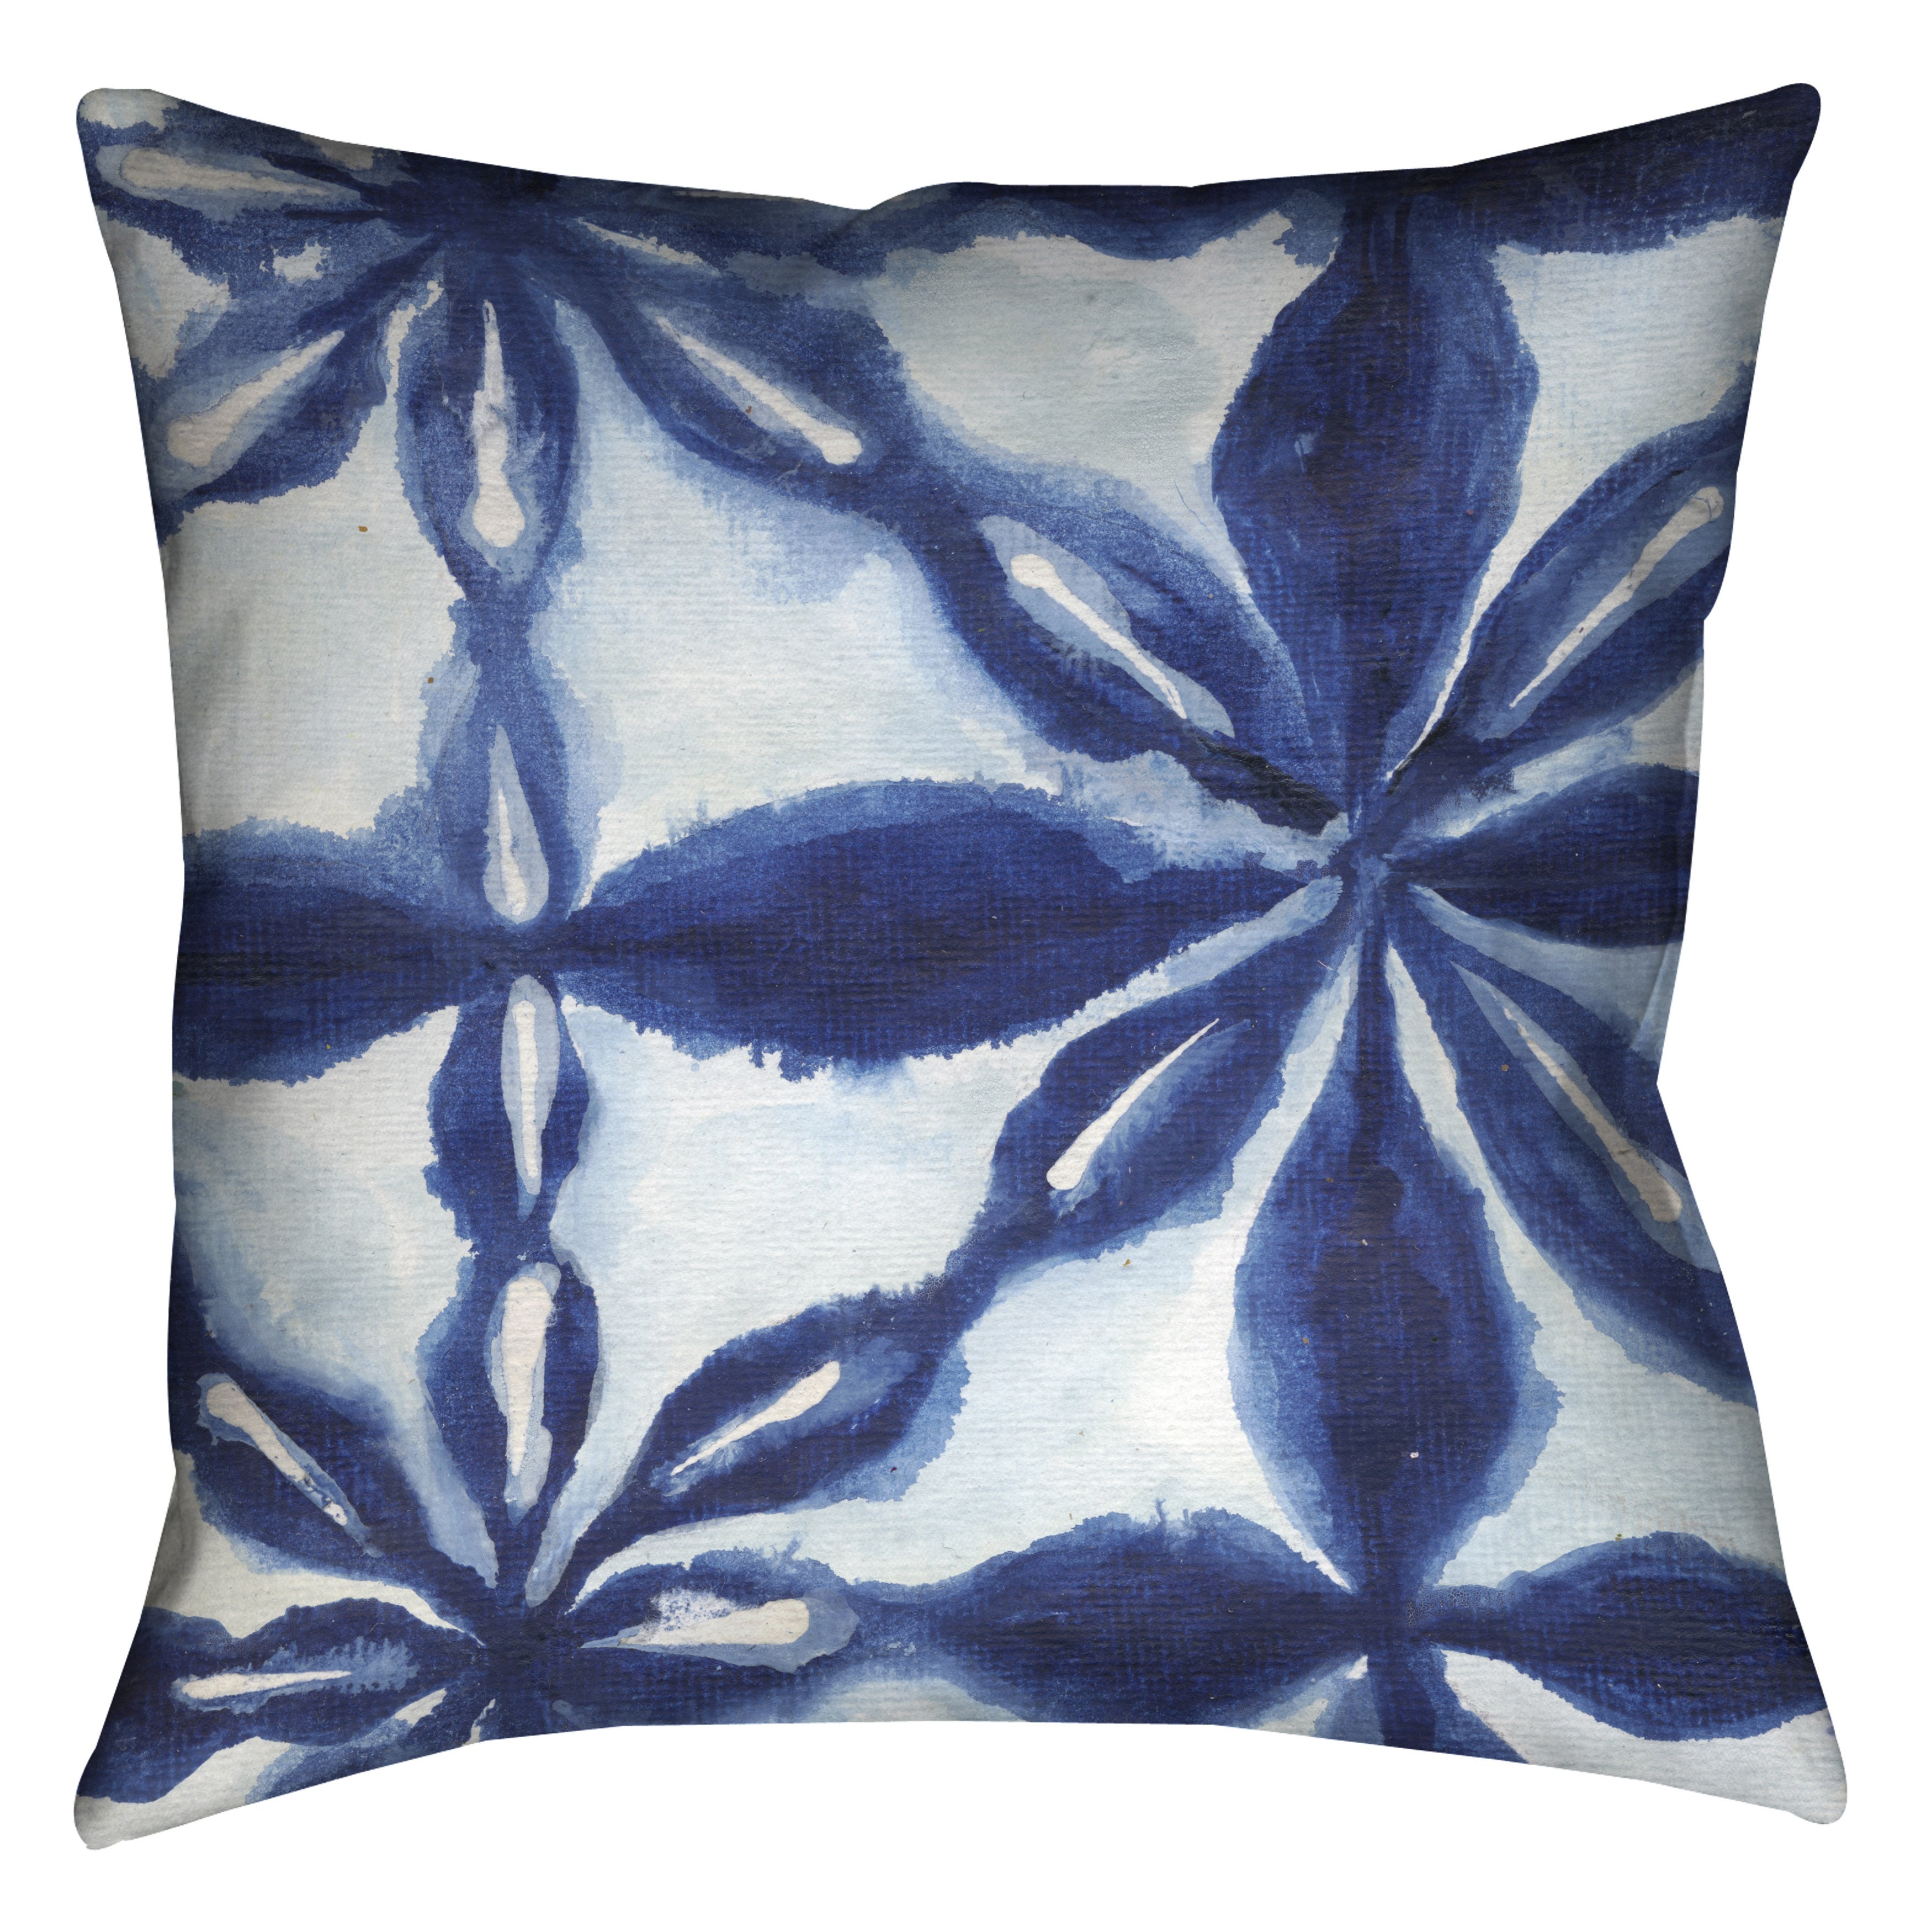 Laural Home Indigo Tie Dye I Decorative 18-inch Pillow (18 x 18)